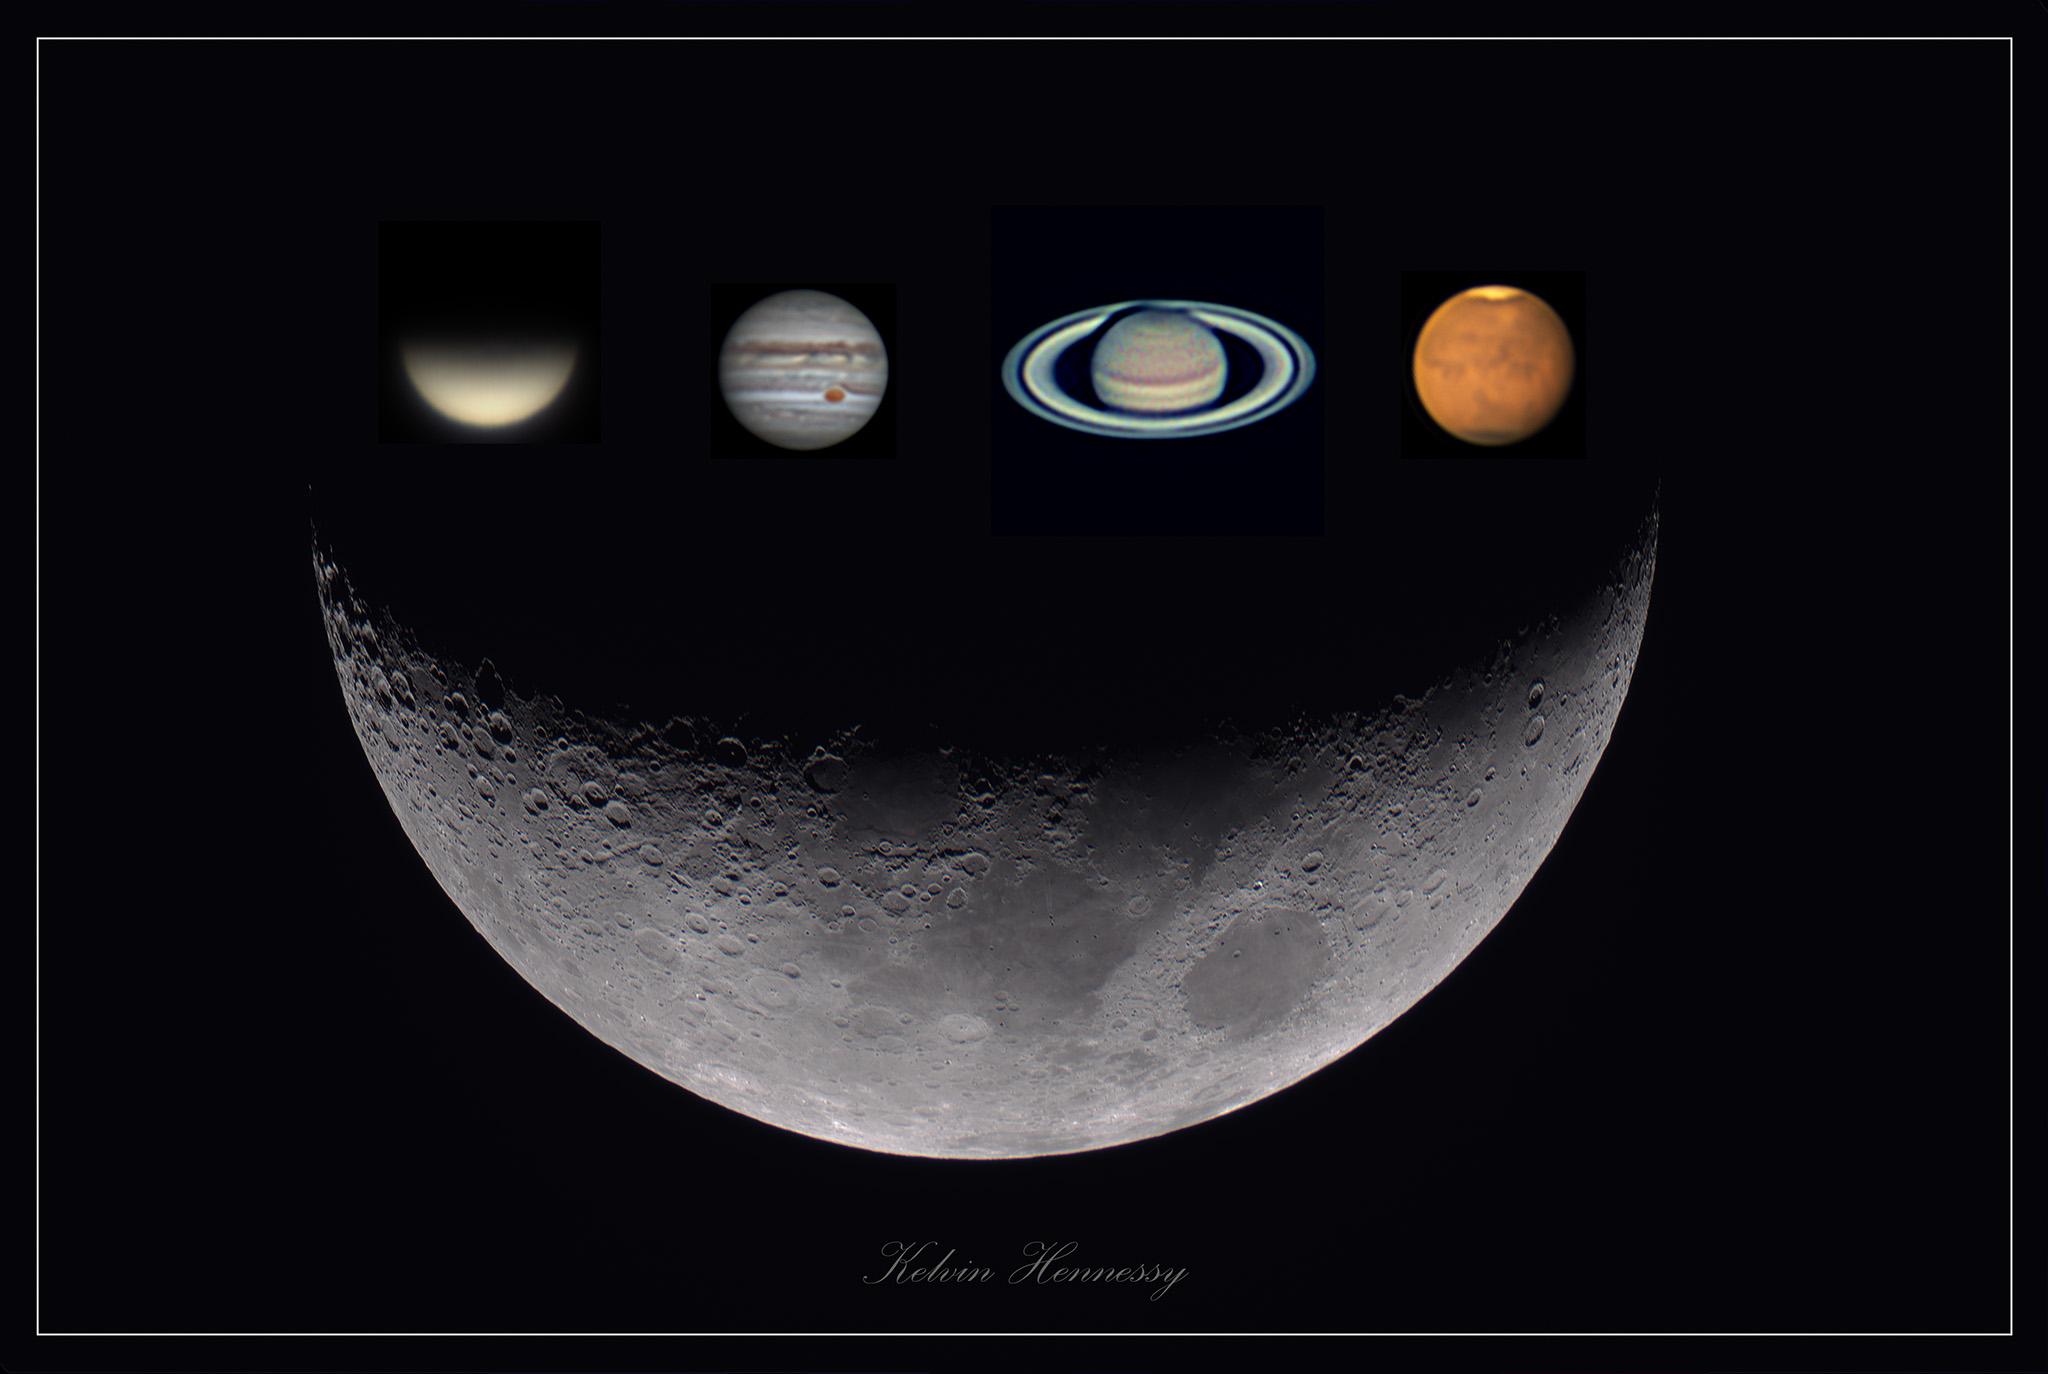 Planets-Moon 30 percent & Planets